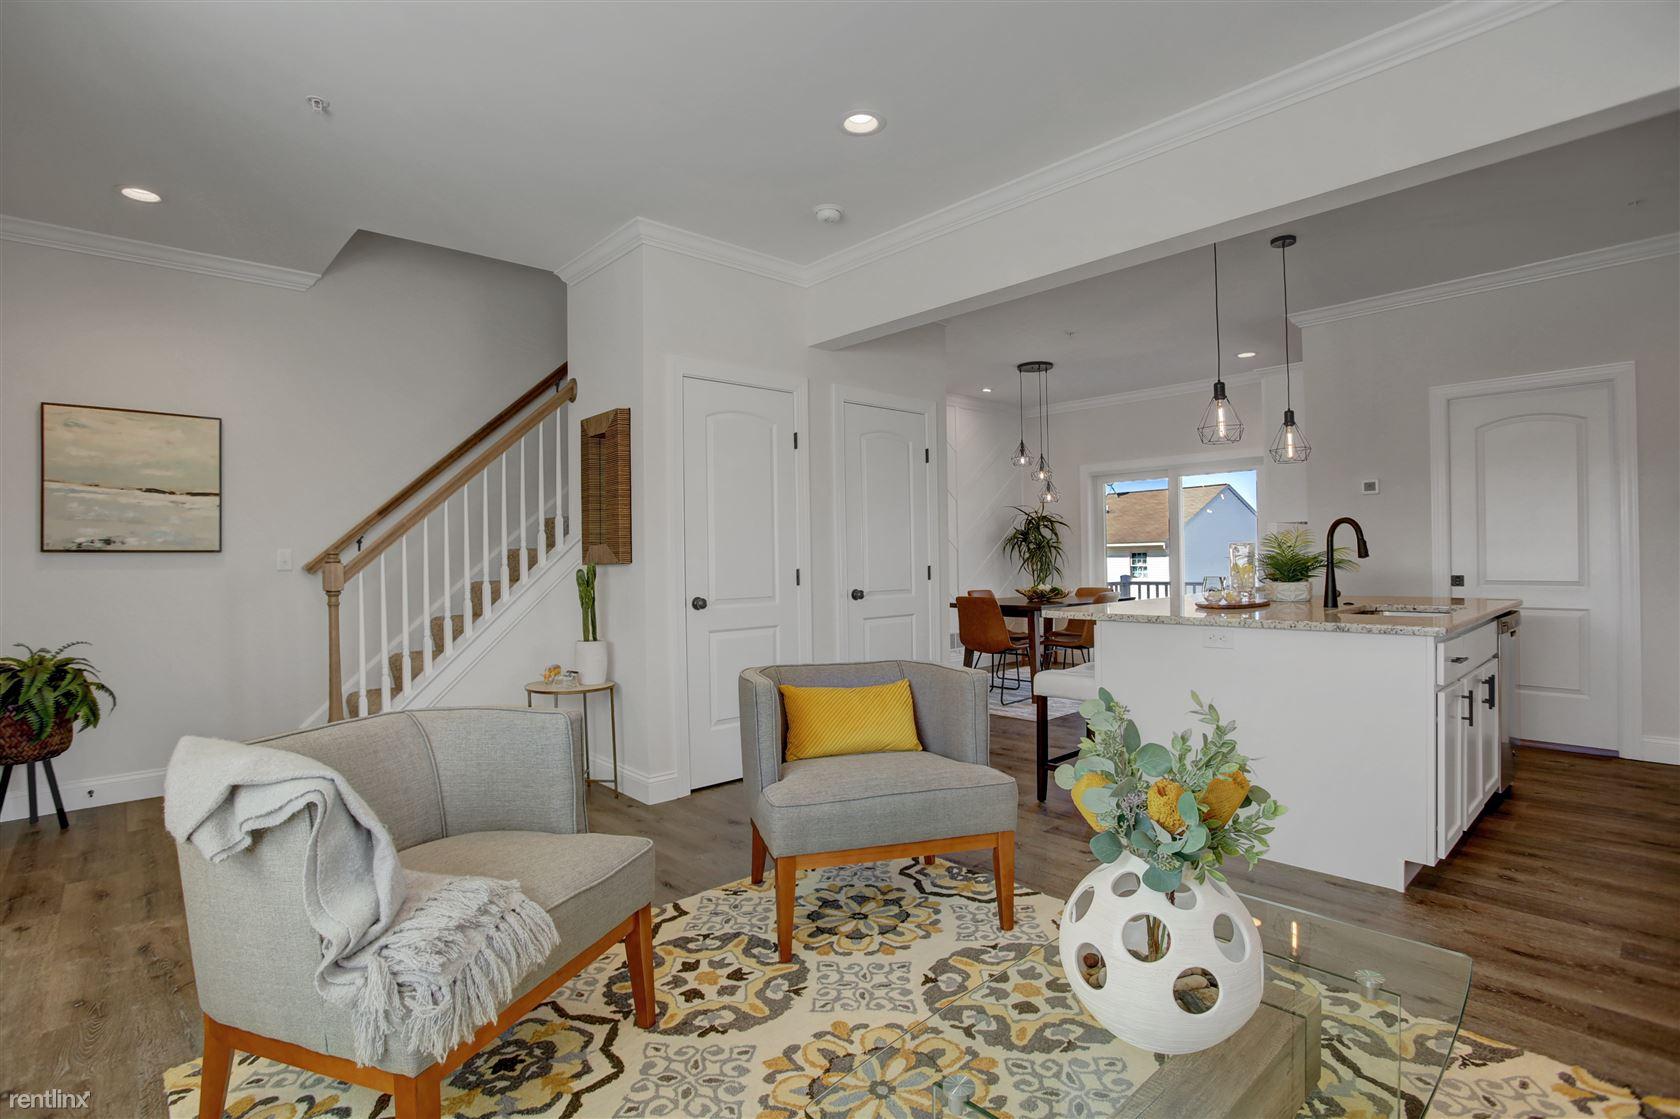 983 Old Elizabethtown Rd, Elizabethtown, PA - $1,695 USD/ month